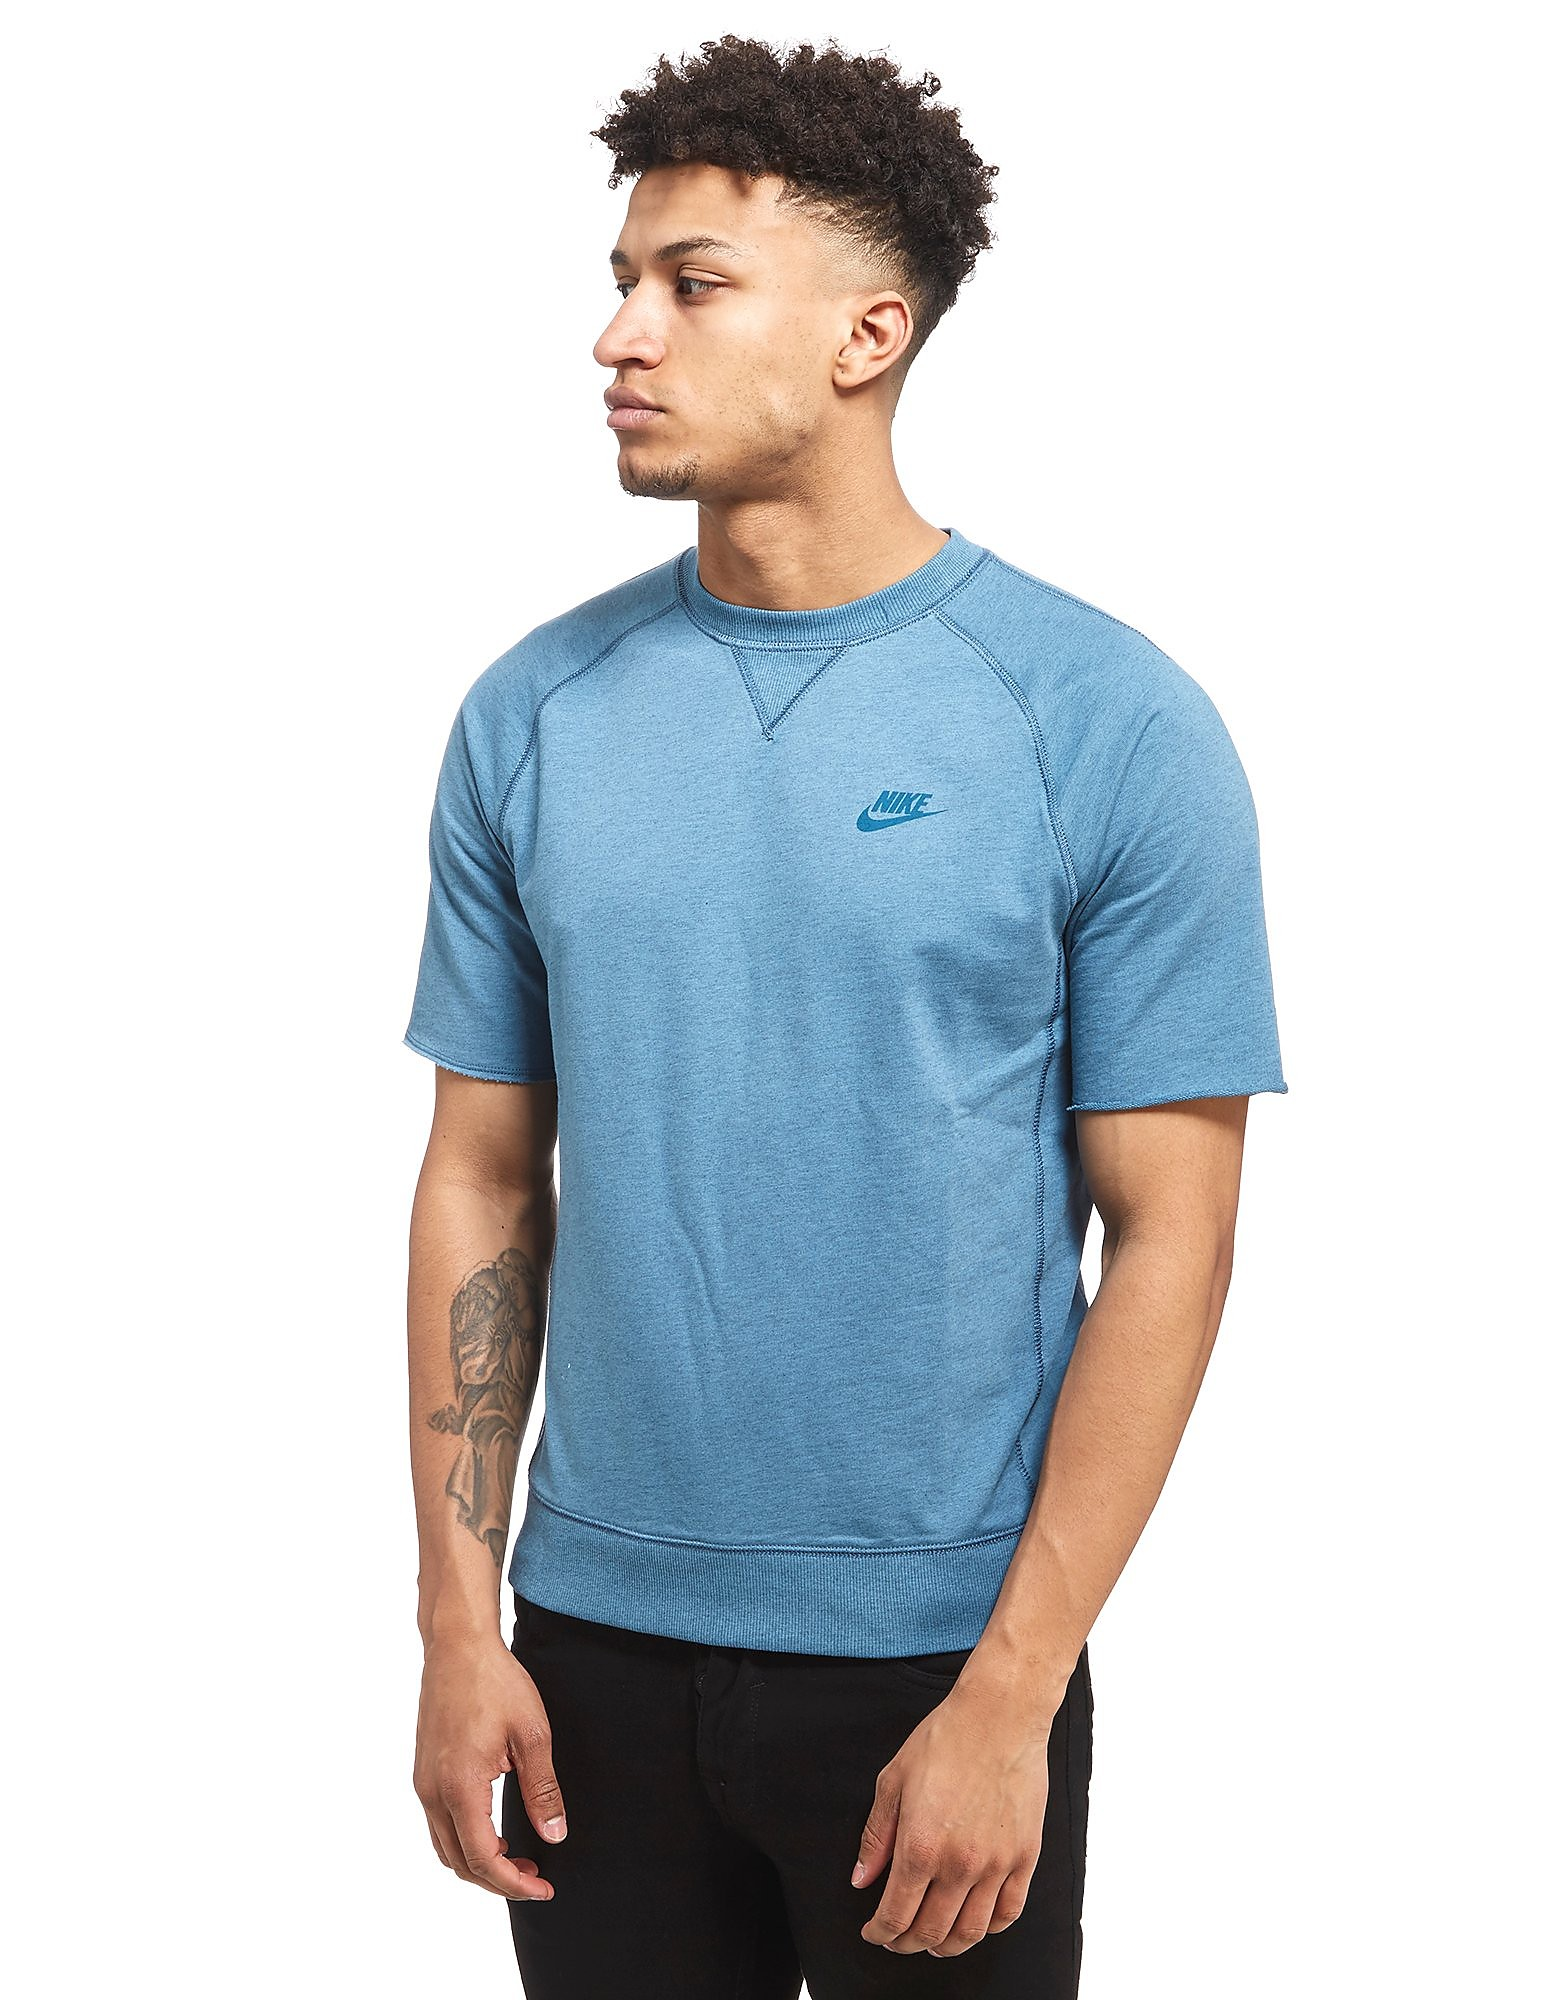 Nike Sweatshirt Ultra Wash Crew Homme